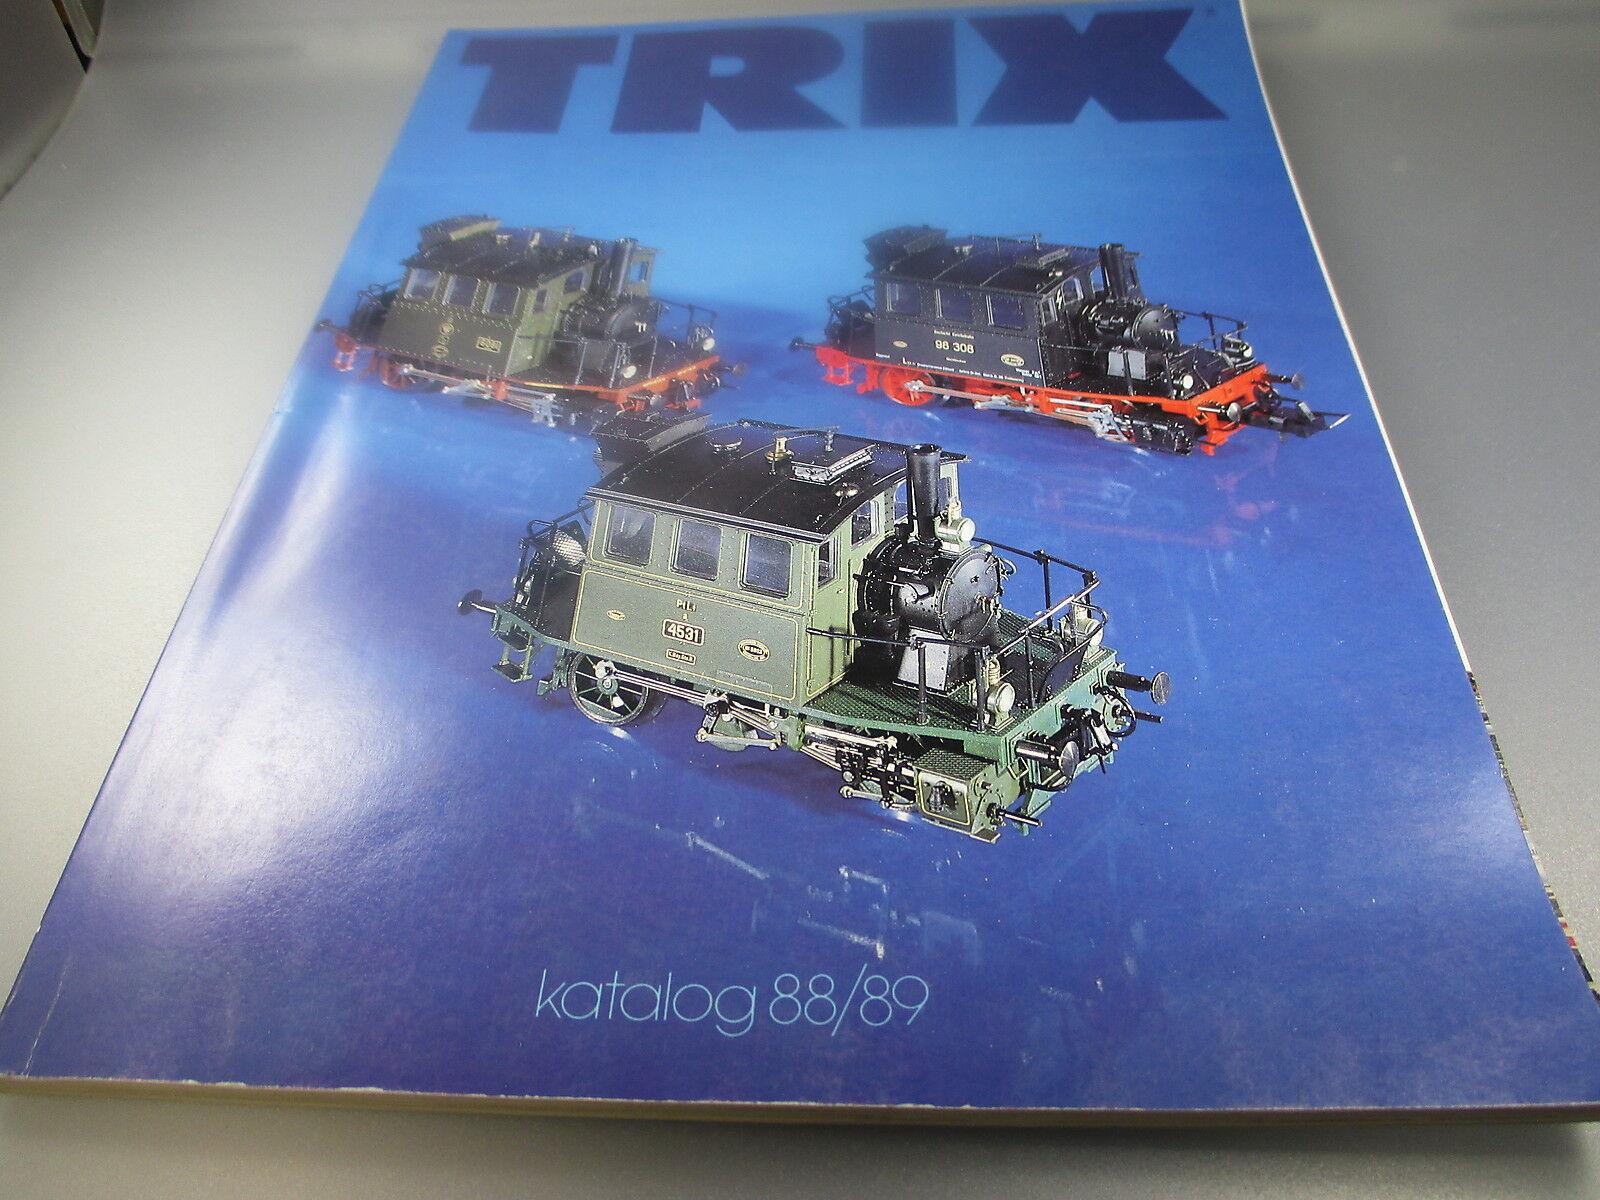 Trix  Katalog 88 89  (Korb1)